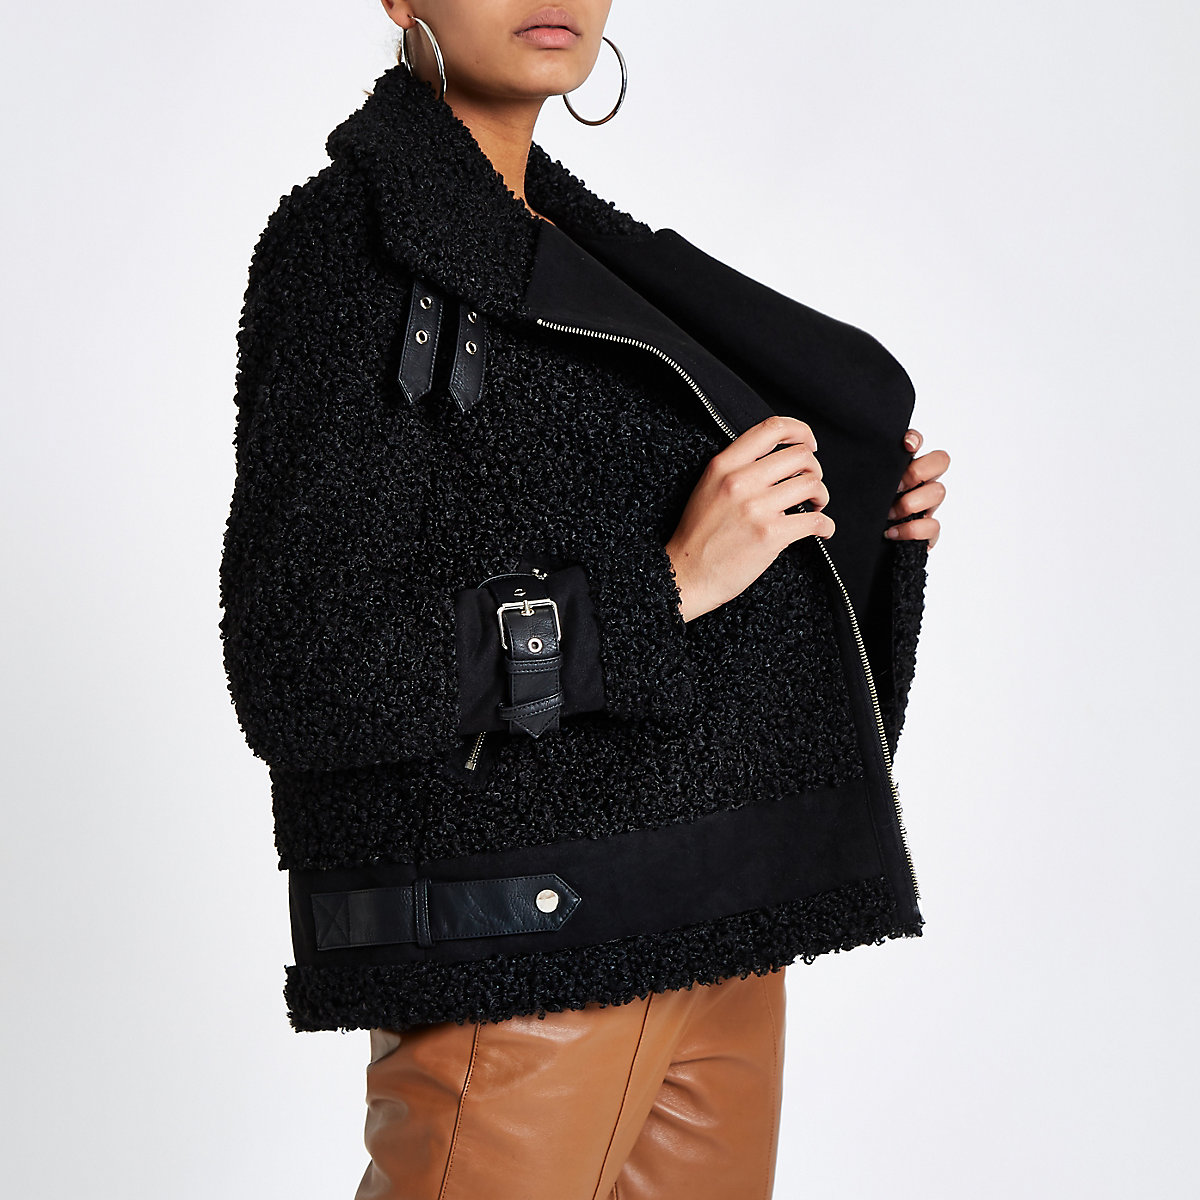 Black borg aviator jacket